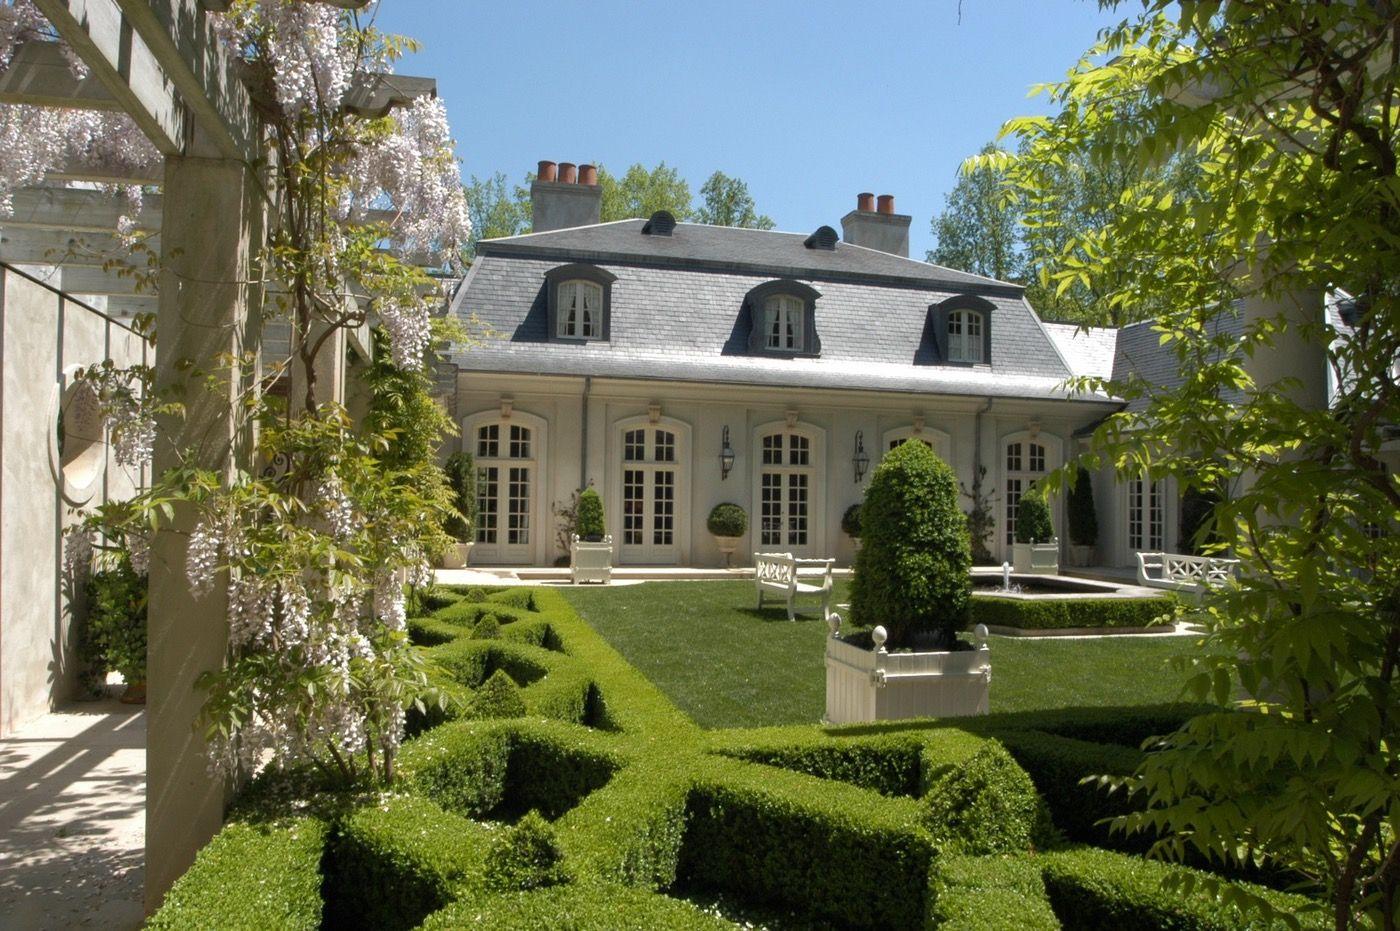 Howard design studio portfolio landscape garden grounds.jpg?ixlib=rails 1.1